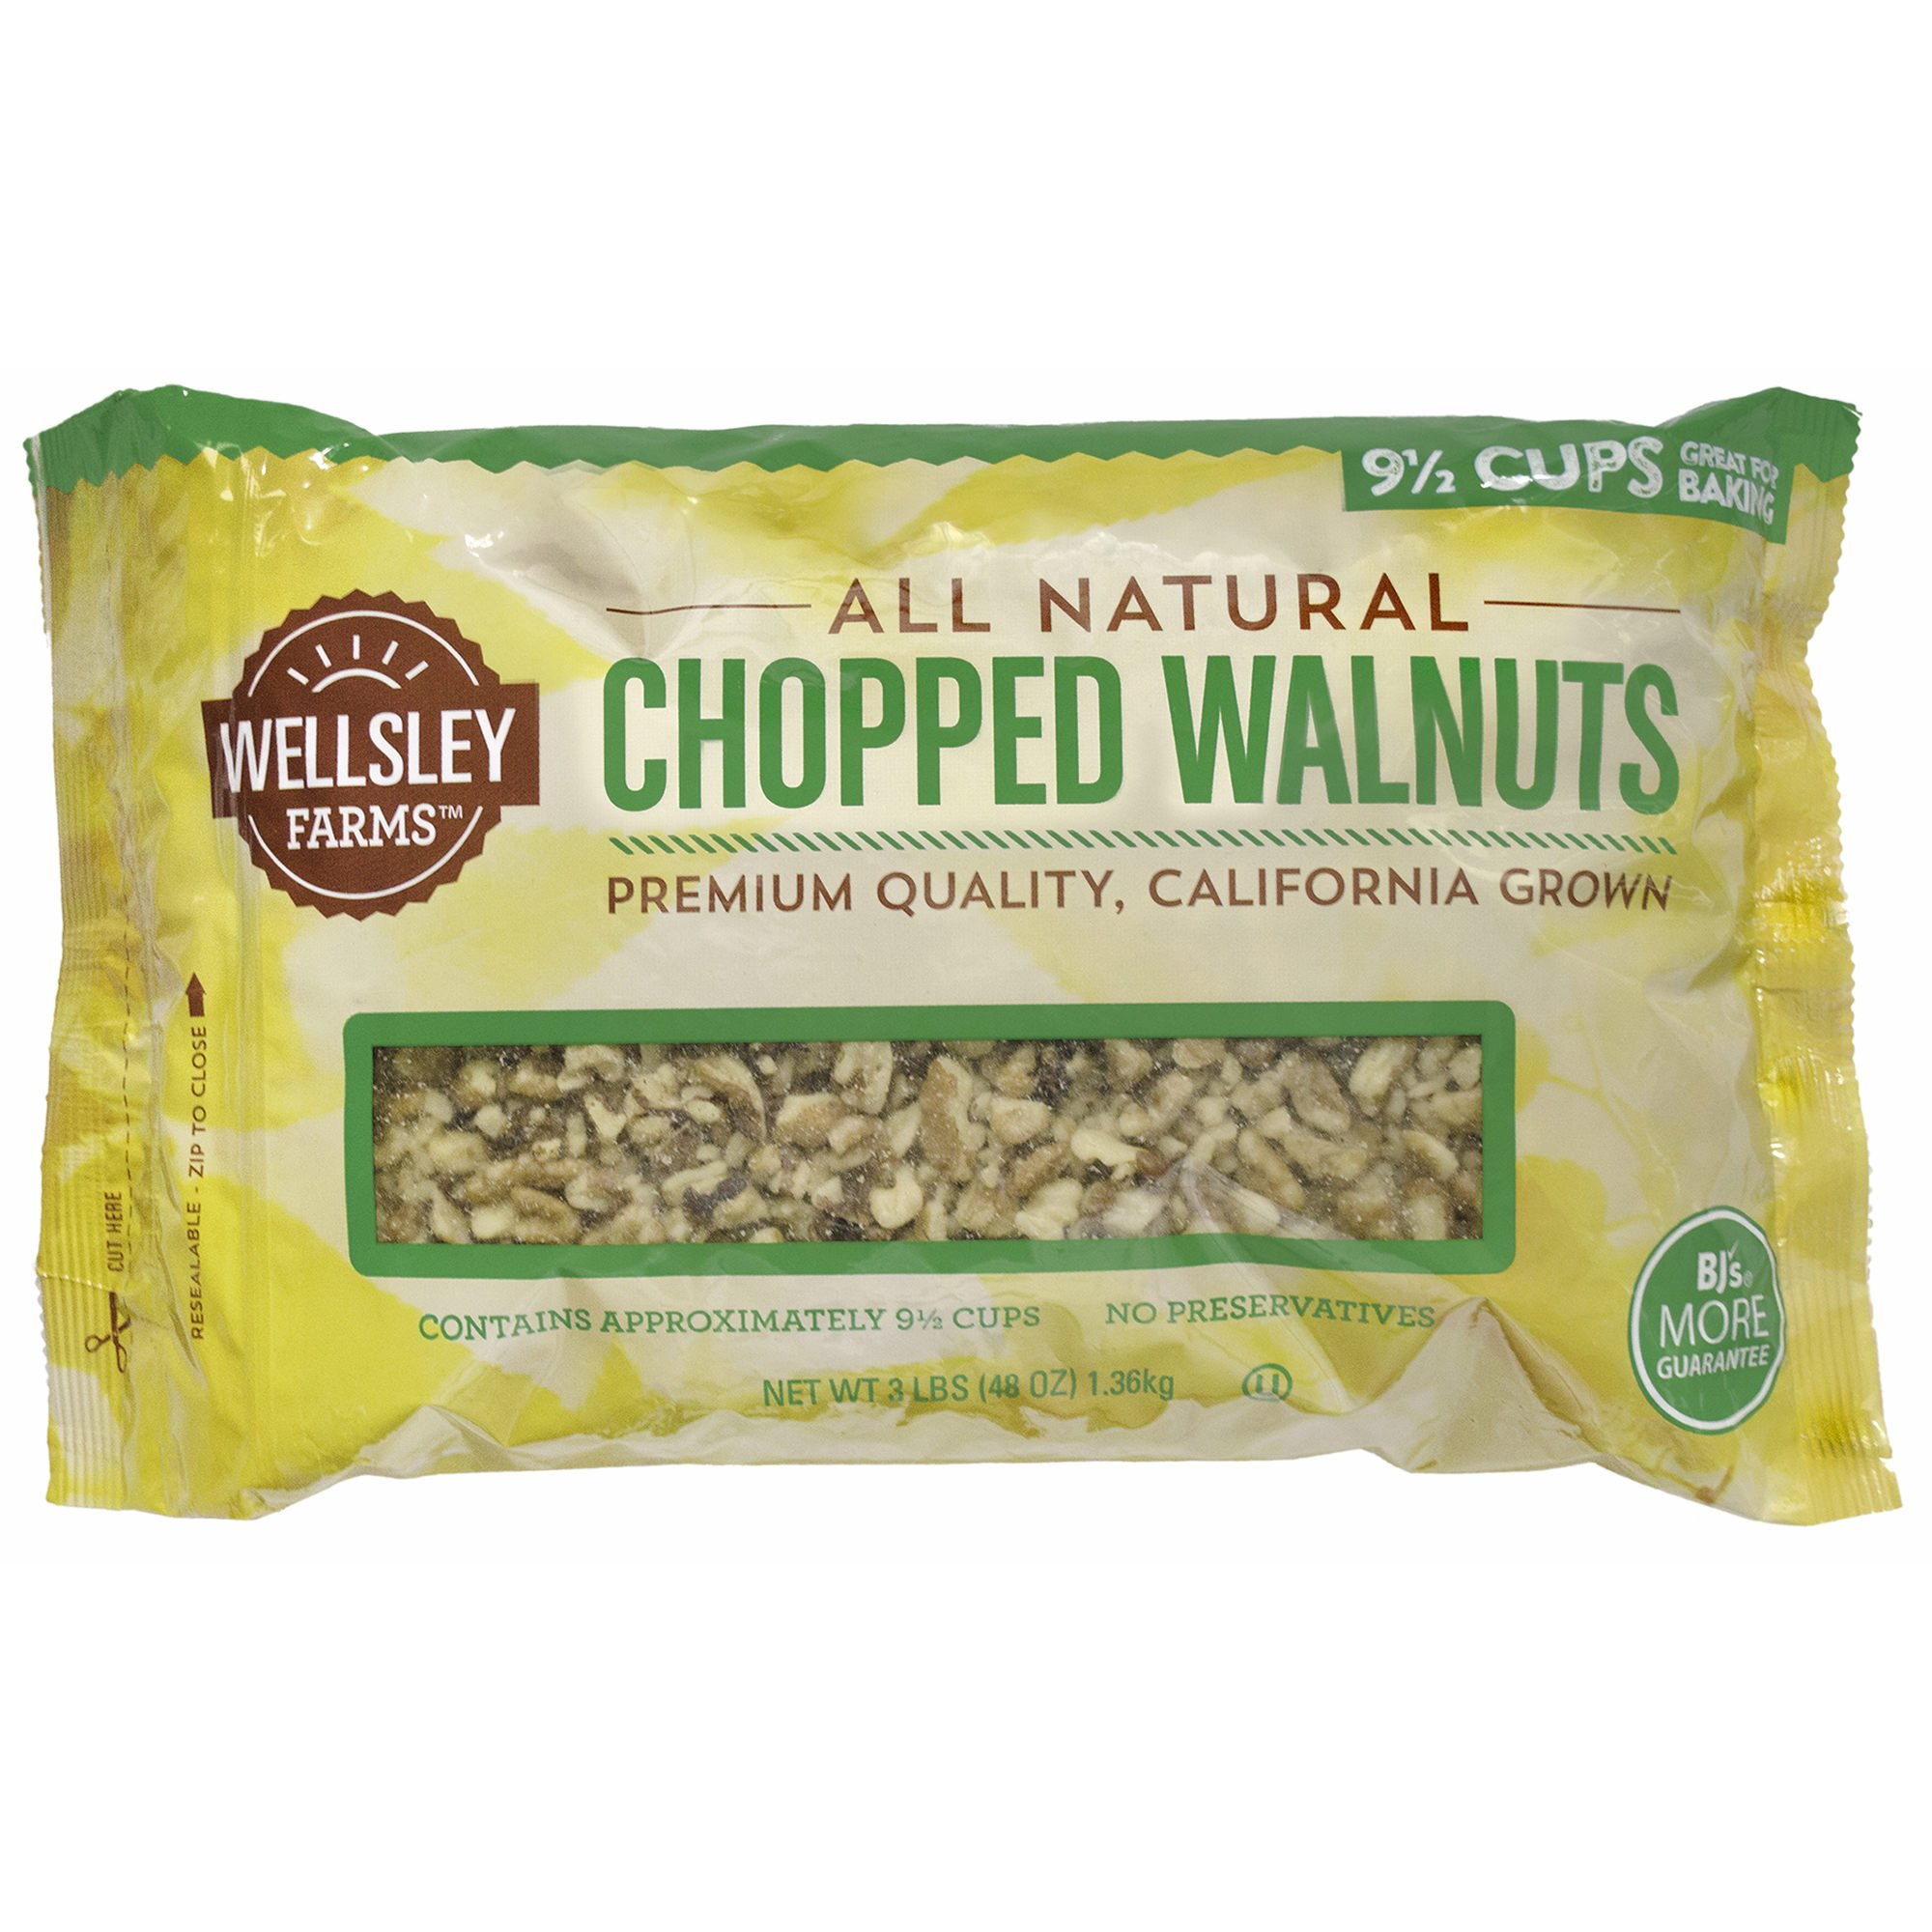 Wellsley Farms Chopped Walnuts, 3 lbs. (pack of 6)